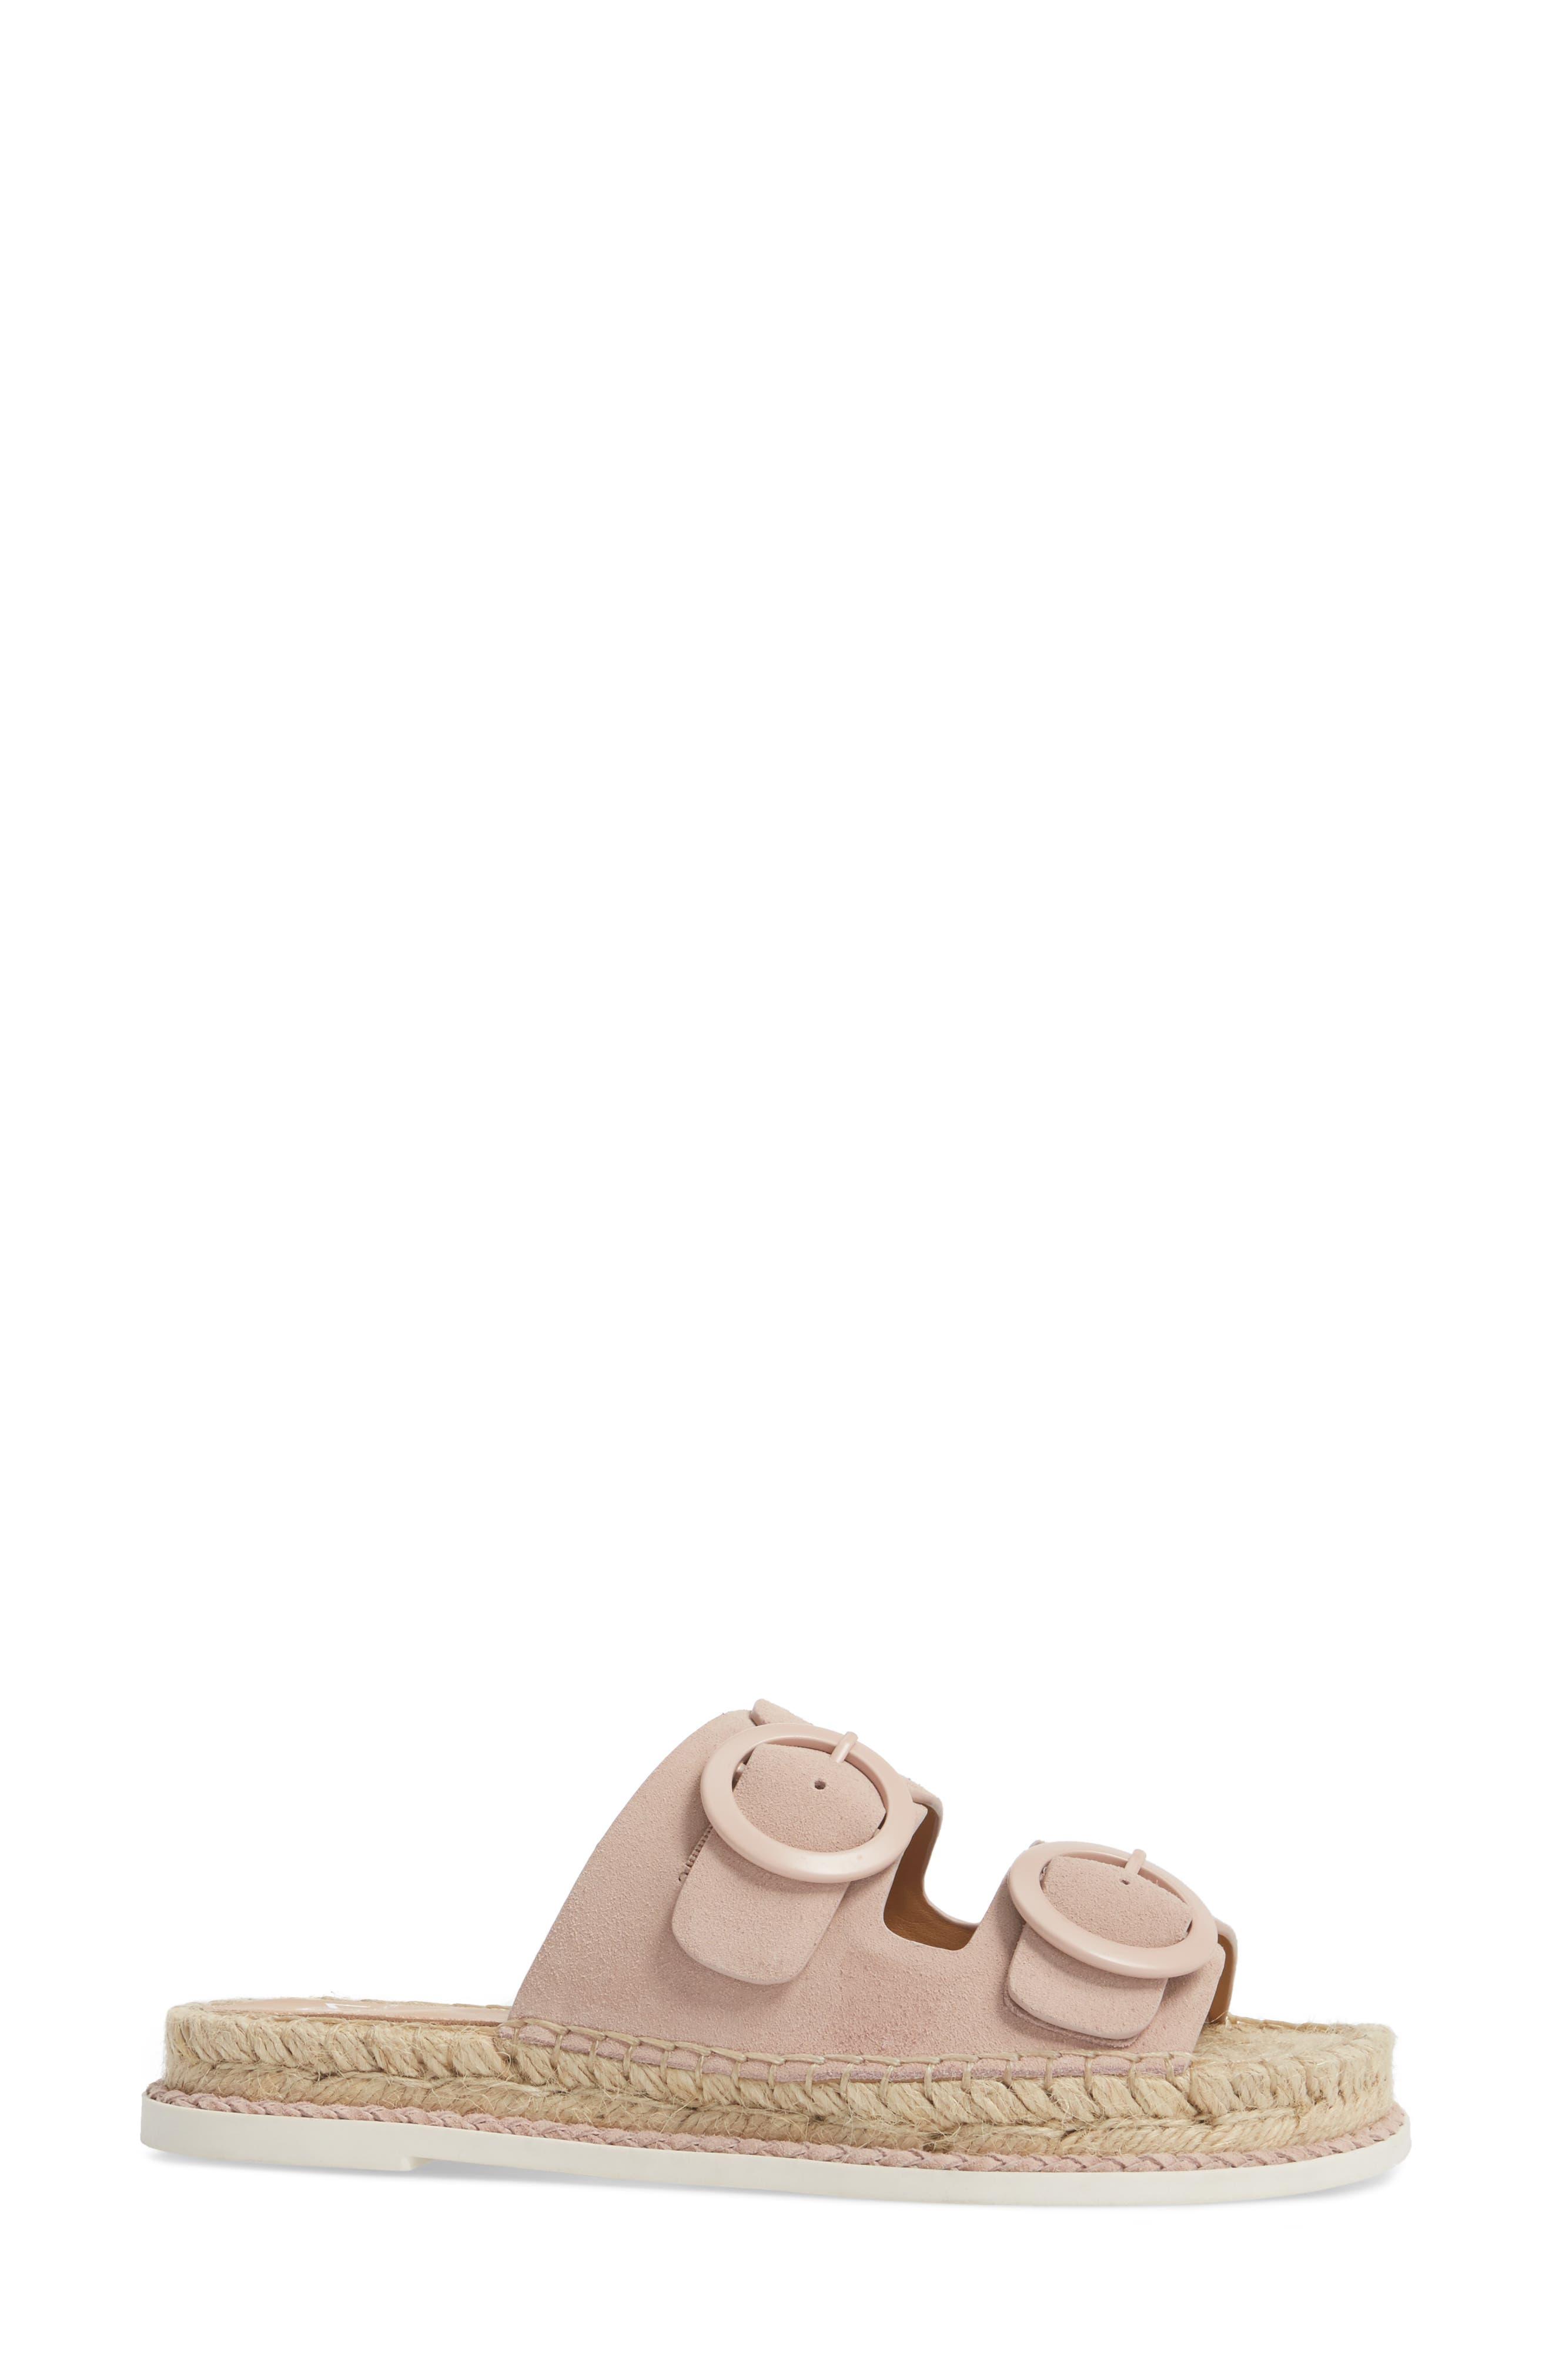 Ramba Espadrille Slide Sandal,                             Alternate thumbnail 9, color,